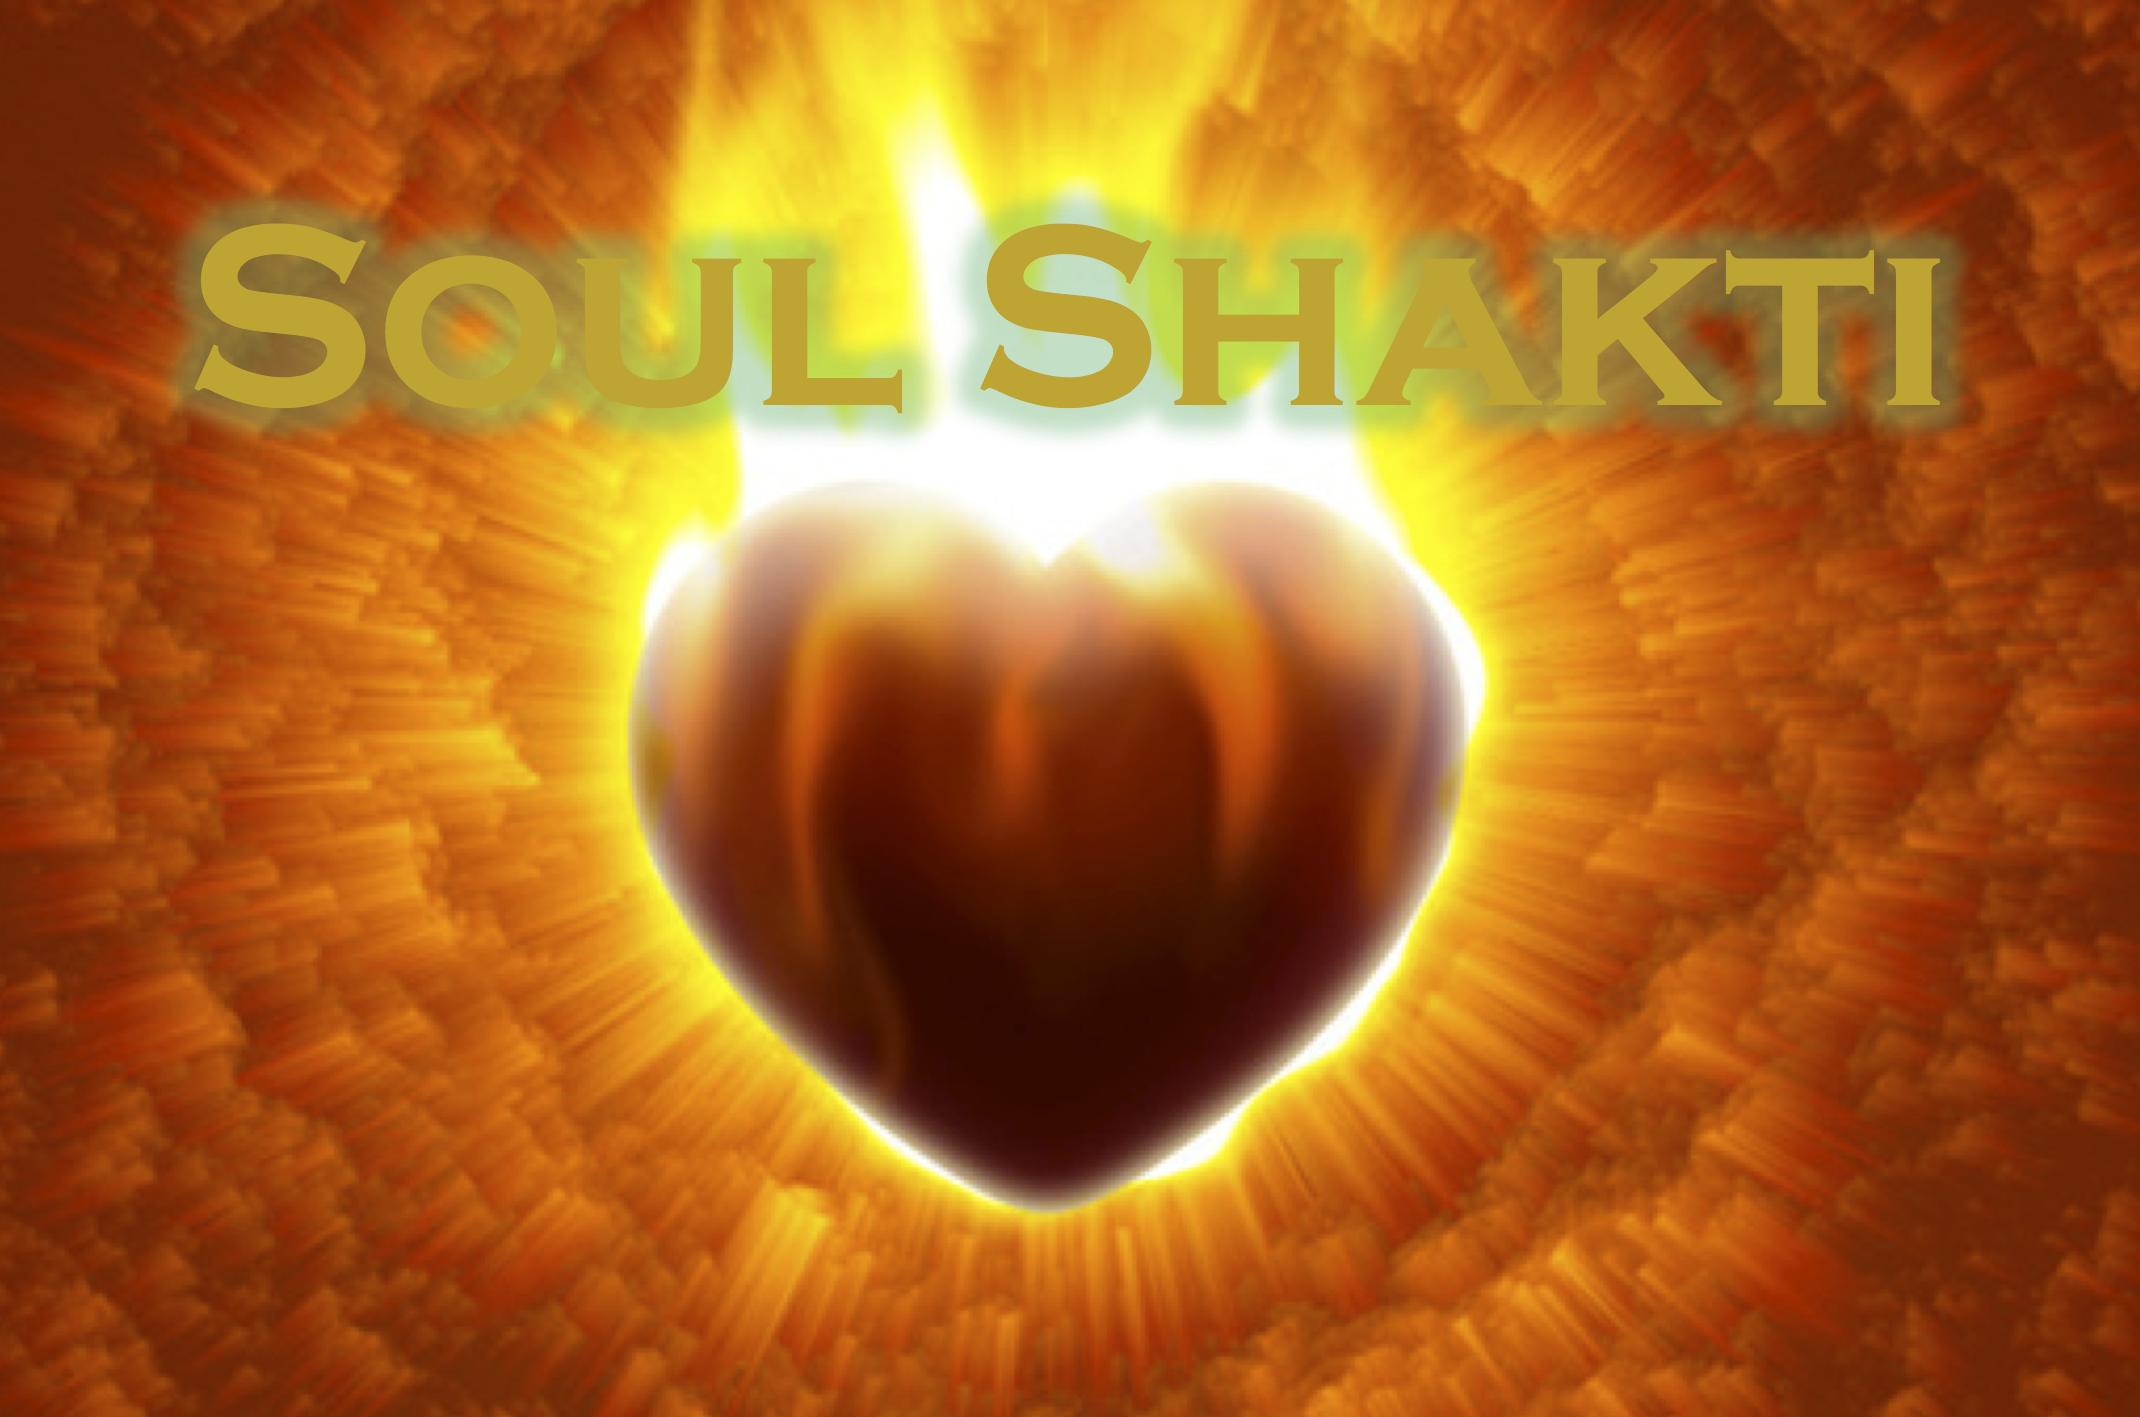 Logo Soul and Shakti.png